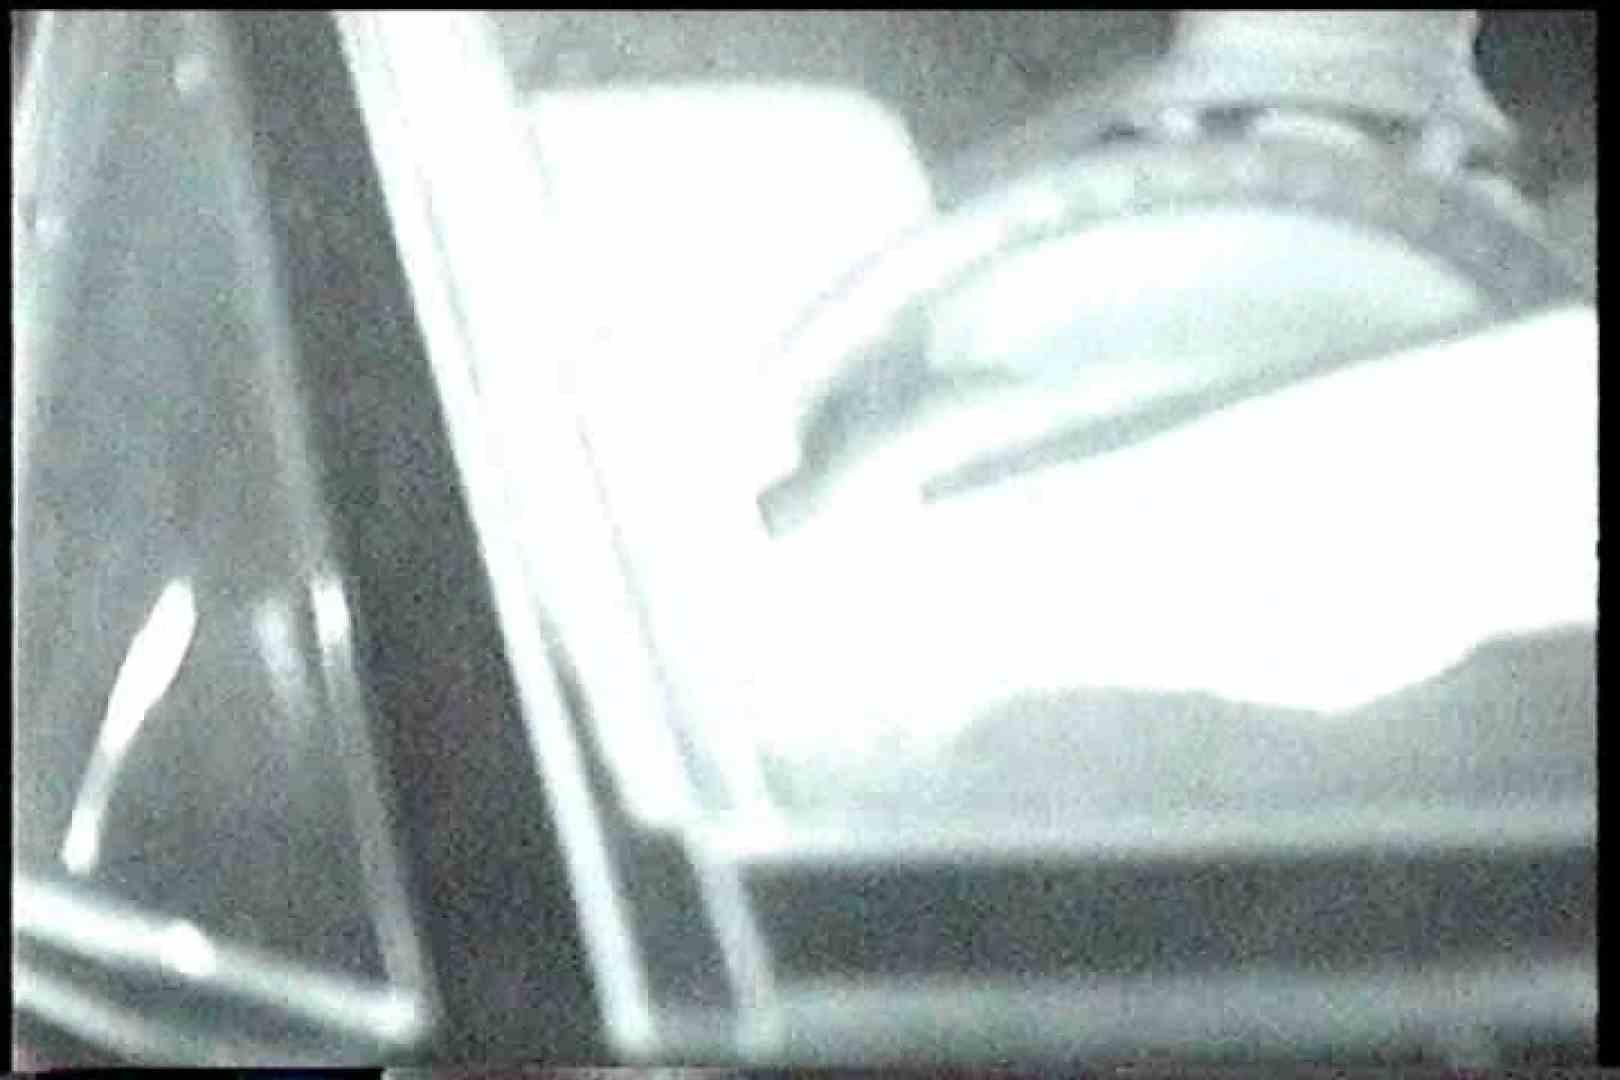 充血監督の深夜の運動会Vol.226 フェラ無修正 盗撮動画紹介 67画像 67